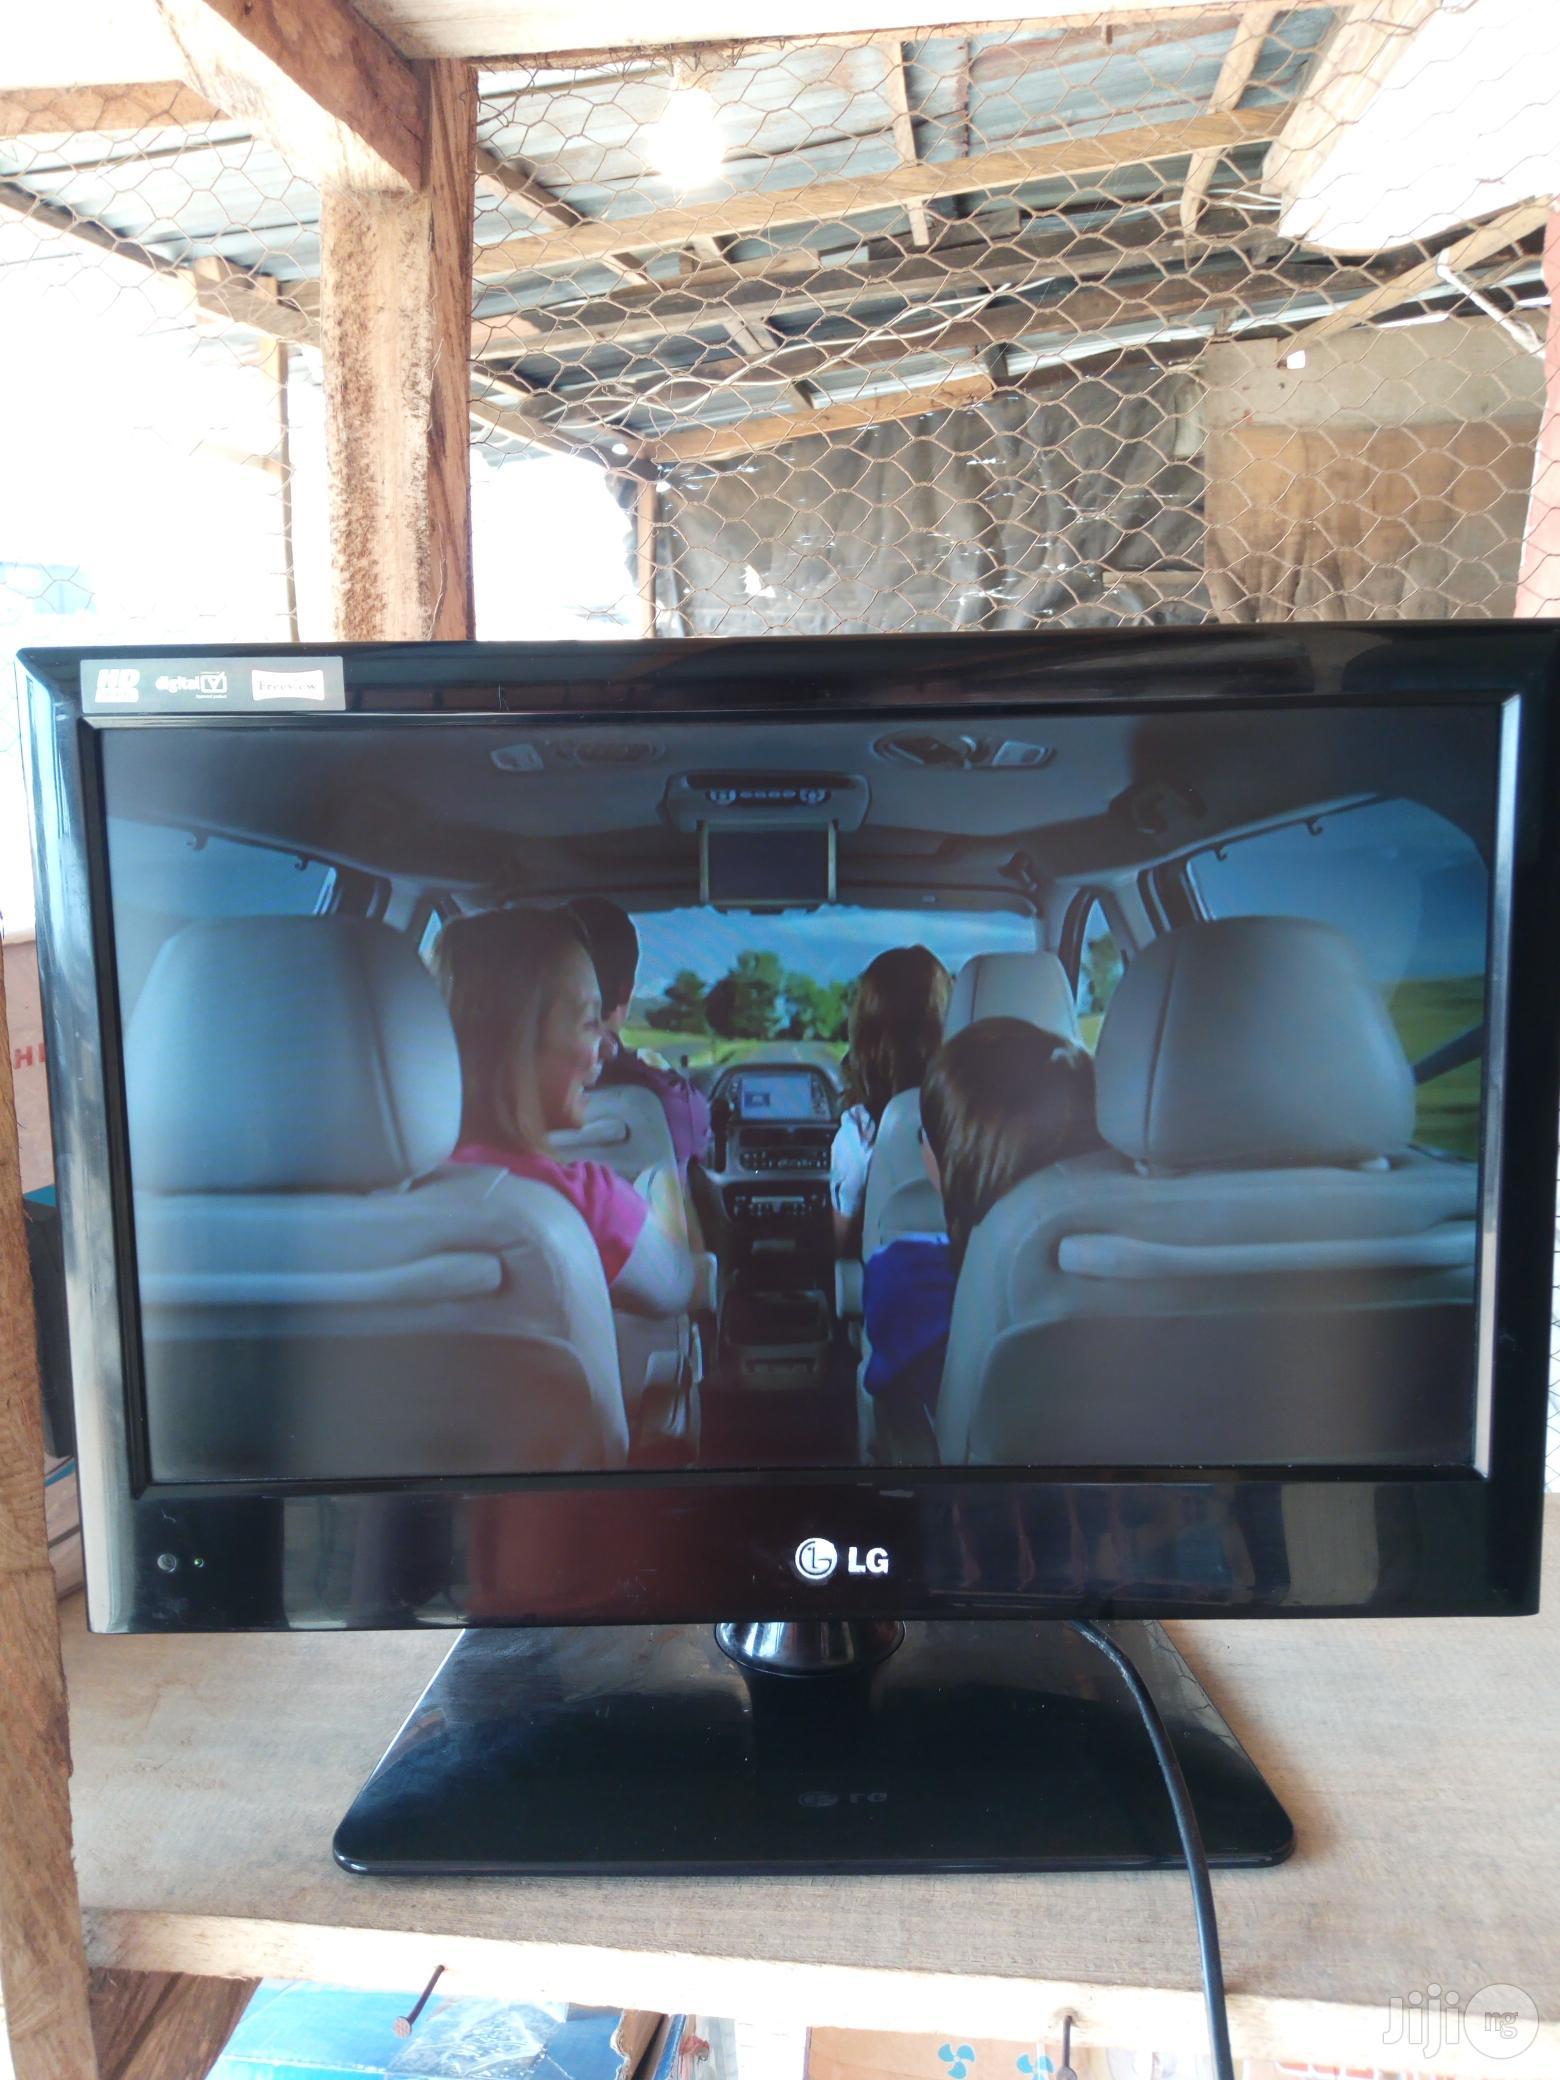 LG LED HD Plasma TV 19inchs   TV & DVD Equipment for sale in Ikorodu, Lagos State, Nigeria